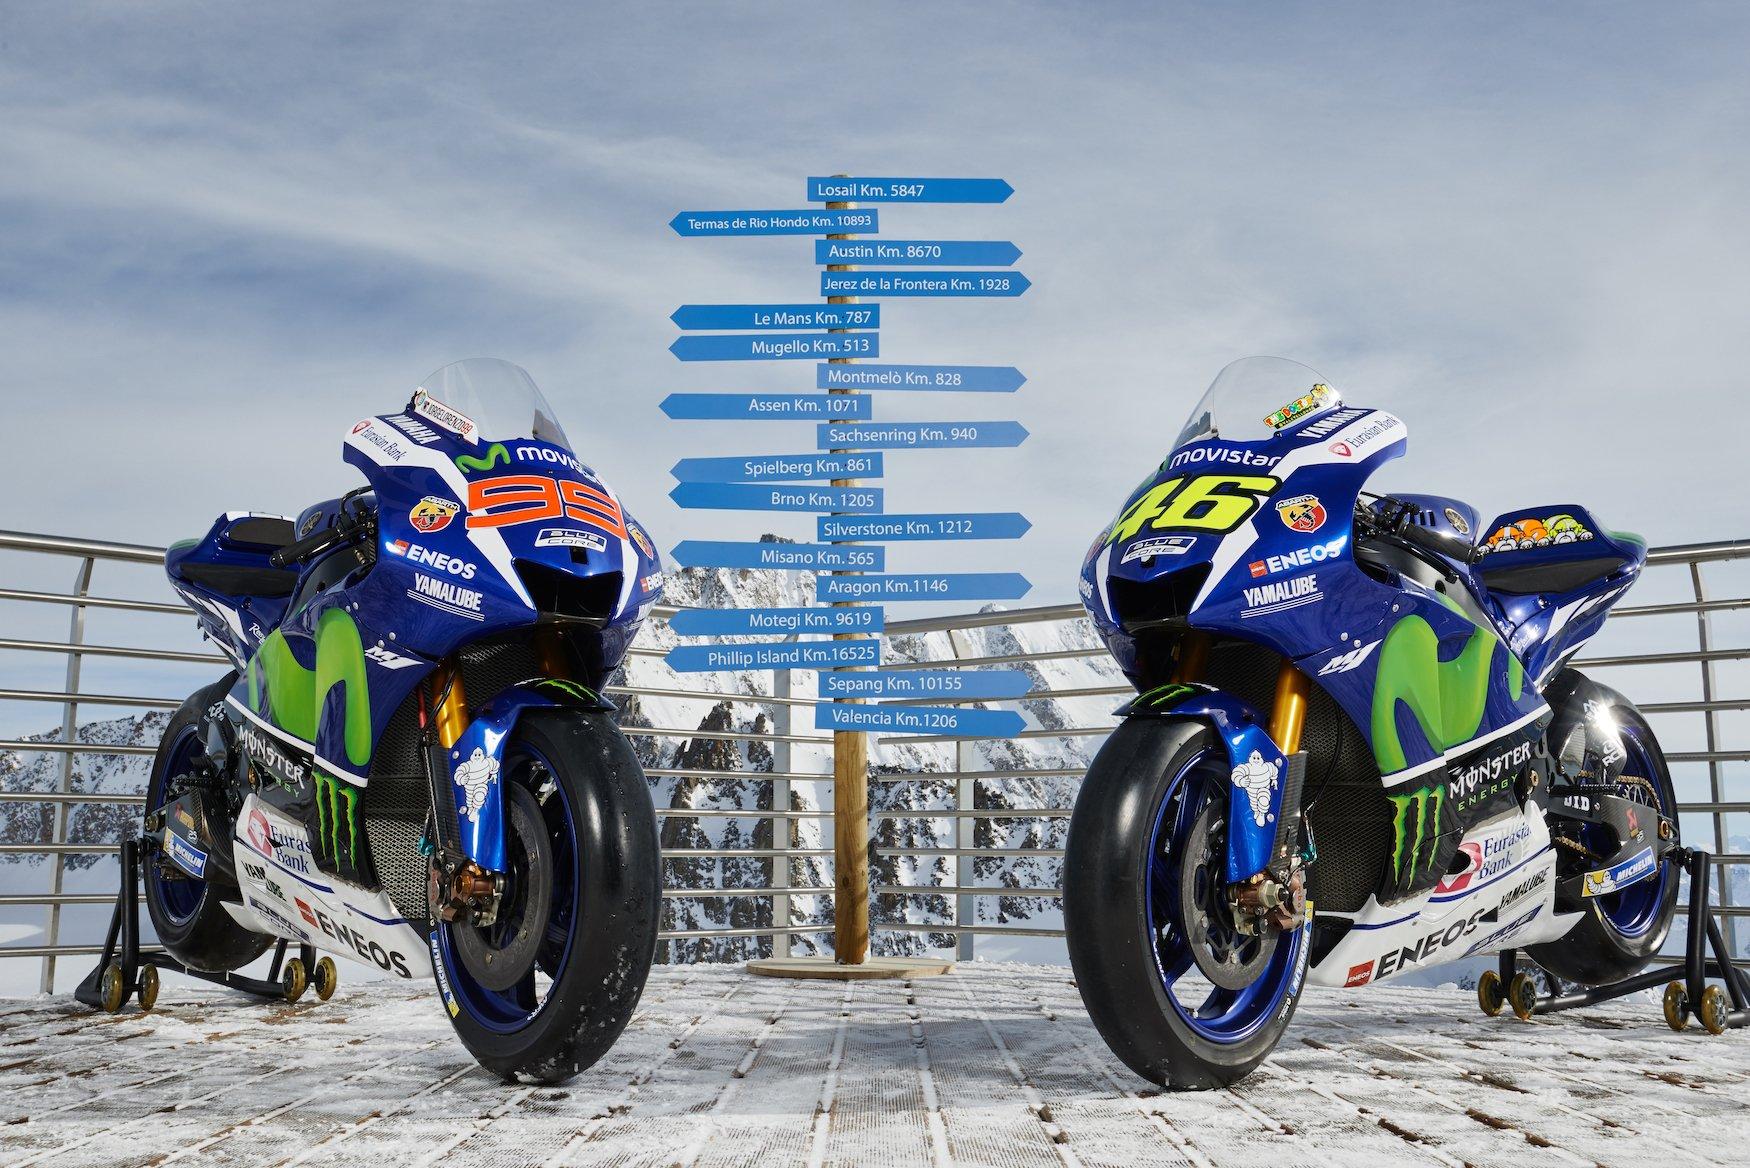 RT @MotoGP_FanClub: #TheM1GoesSkiing  https://t.co/I02cIQbOWl